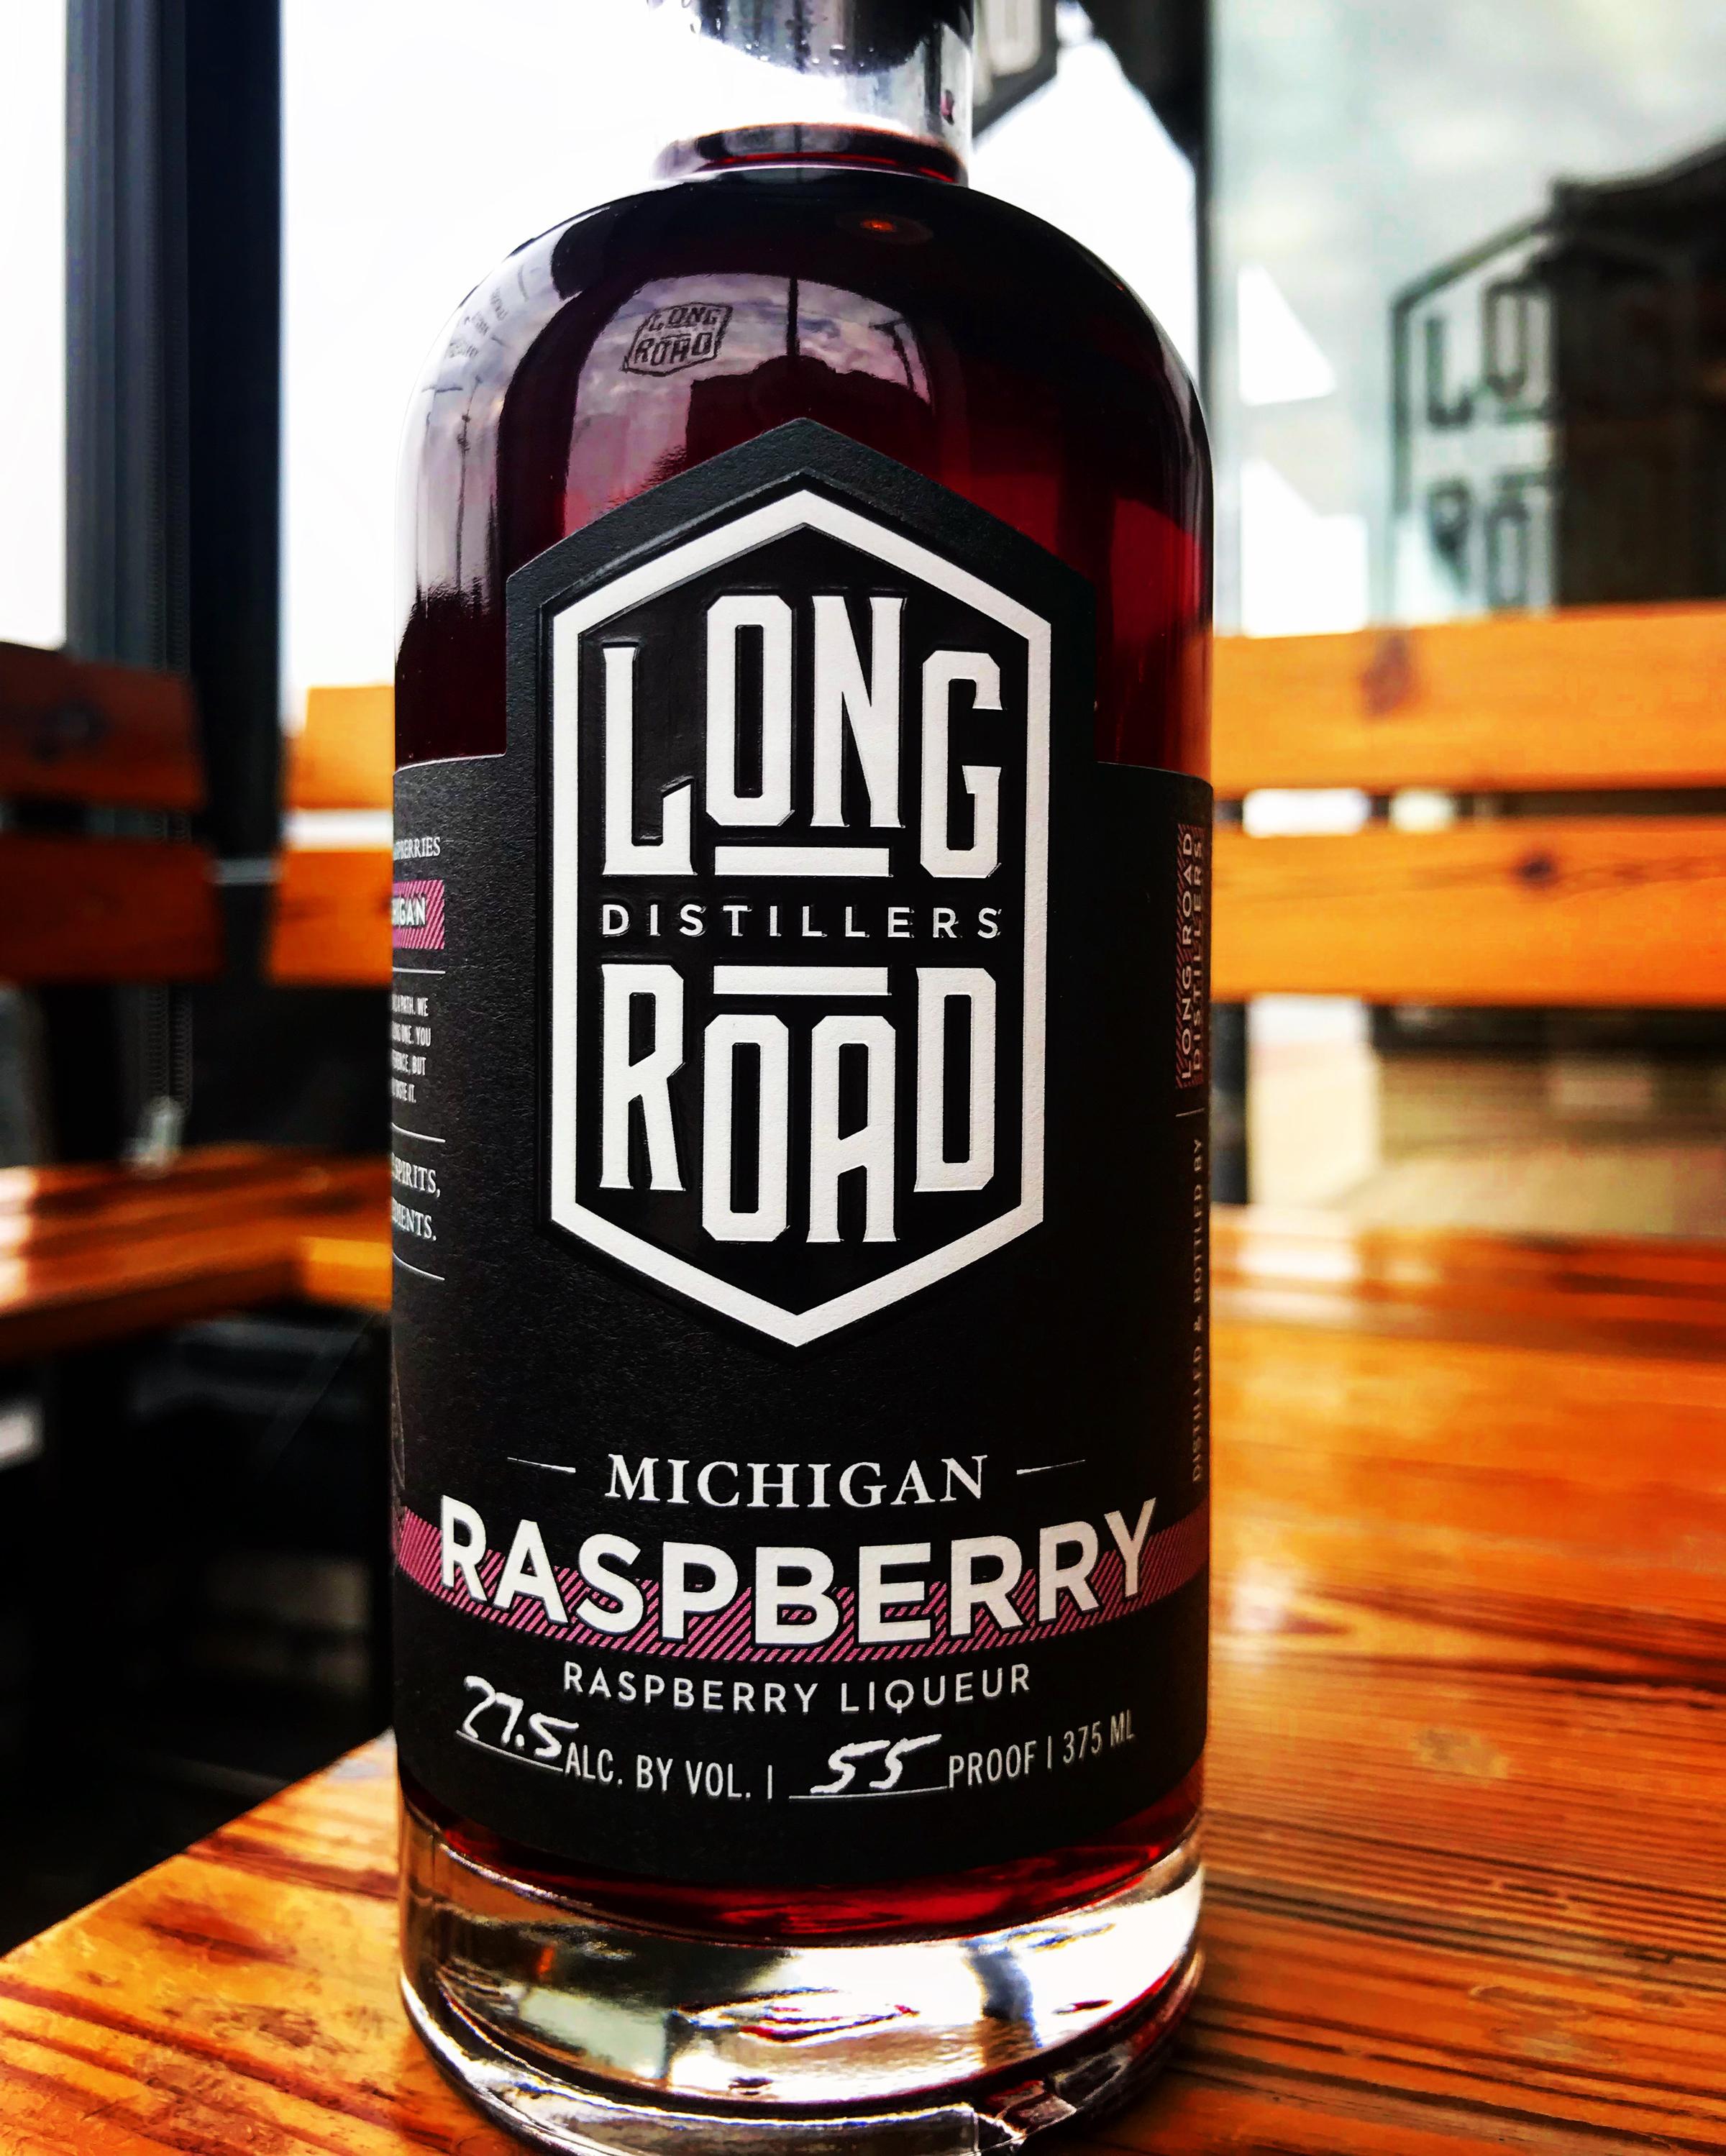 Long Road Distillers Raspberry Liqueur